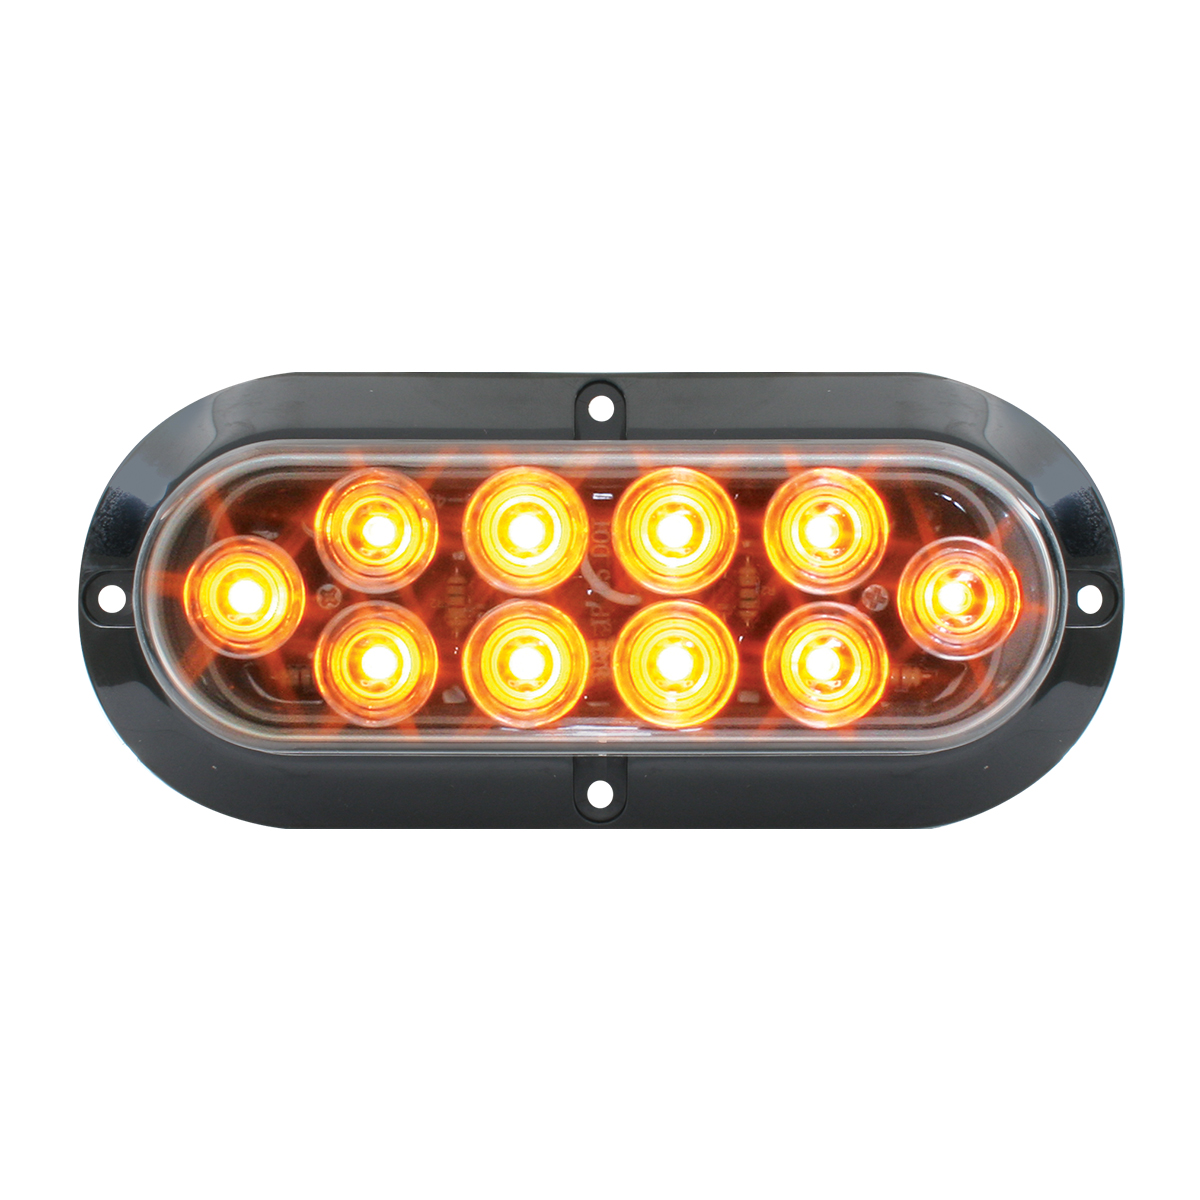 77431 Surface Mount Oval Mega 10 LED Light